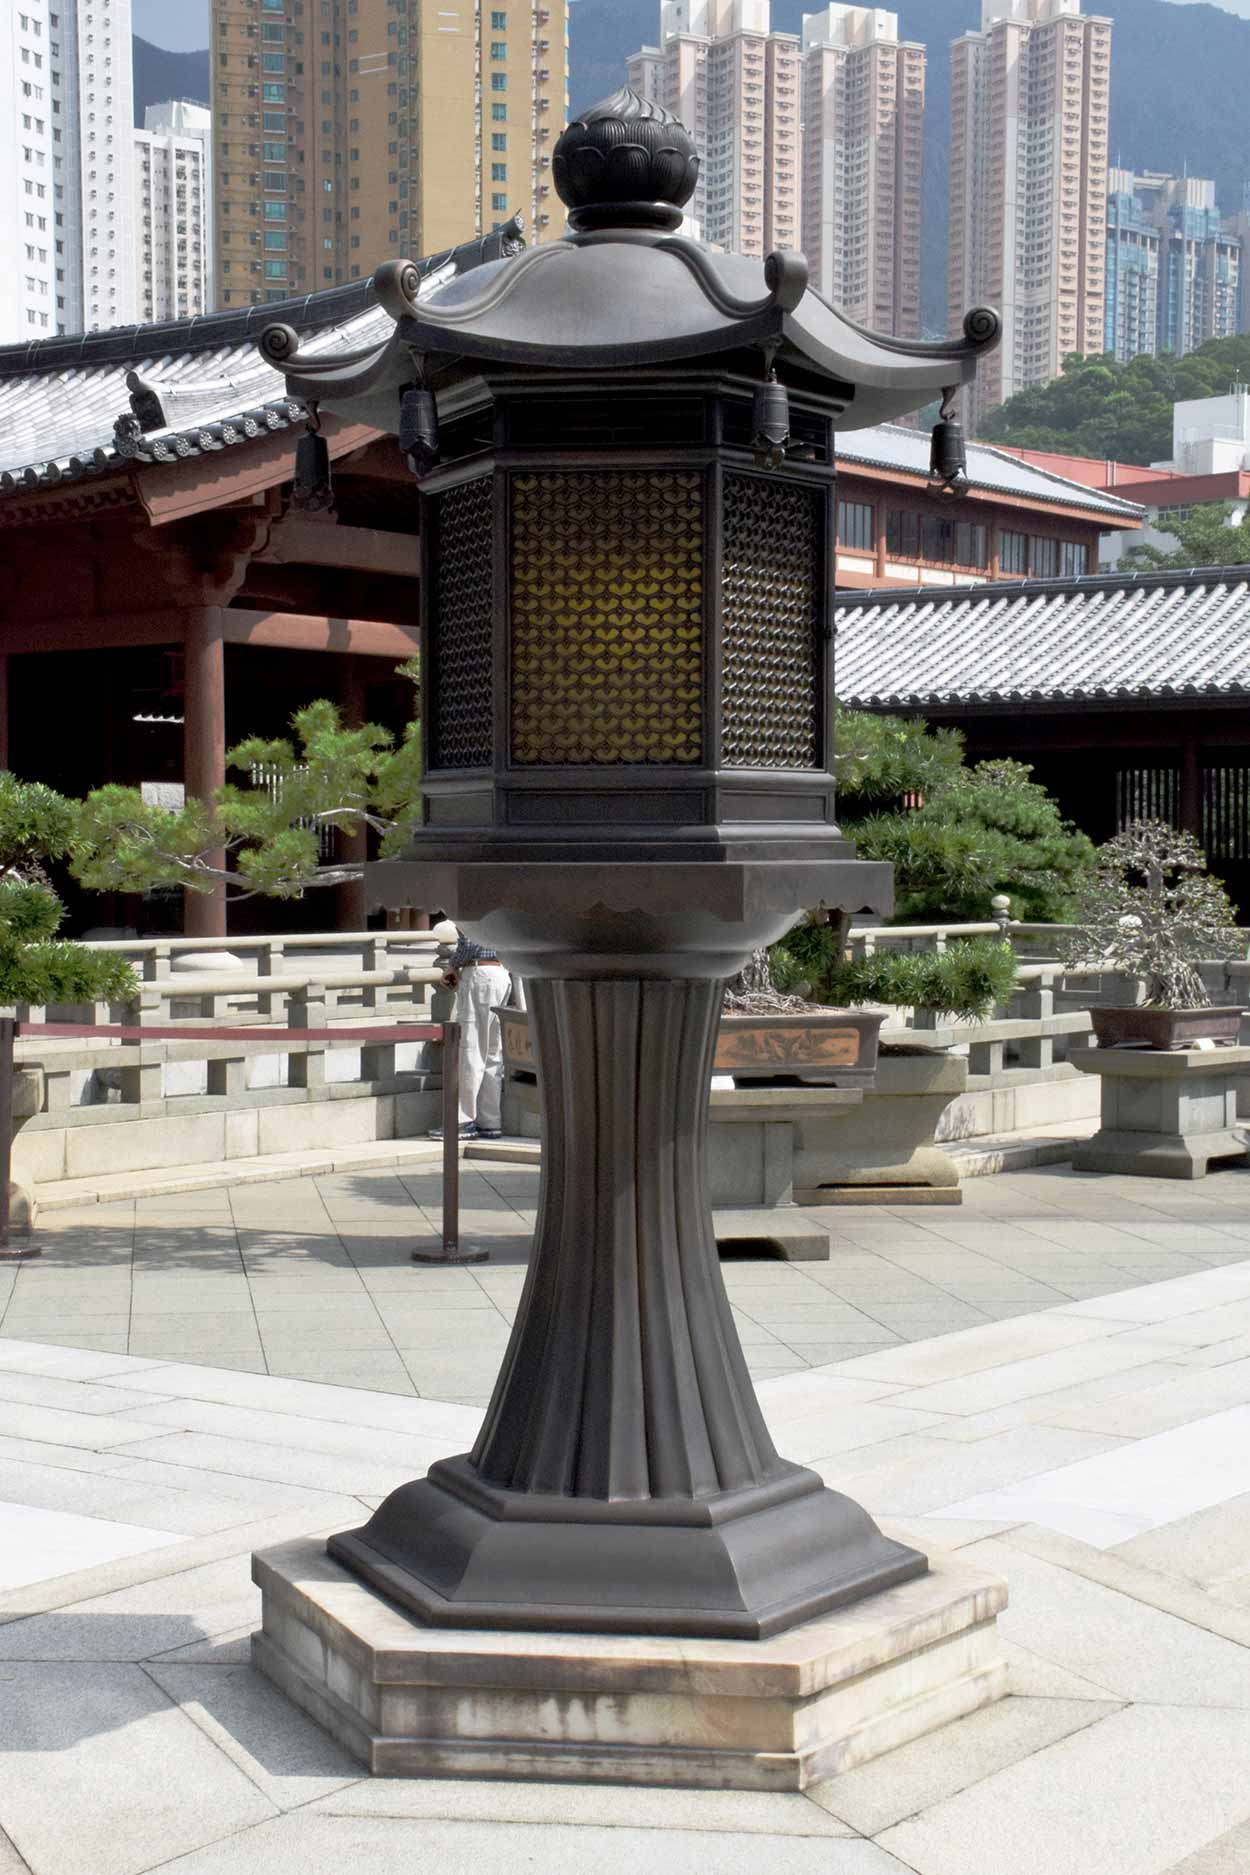 Lantern in the Lotus Pond Garden, Chi Lin Nunnery, Hong Kong, China